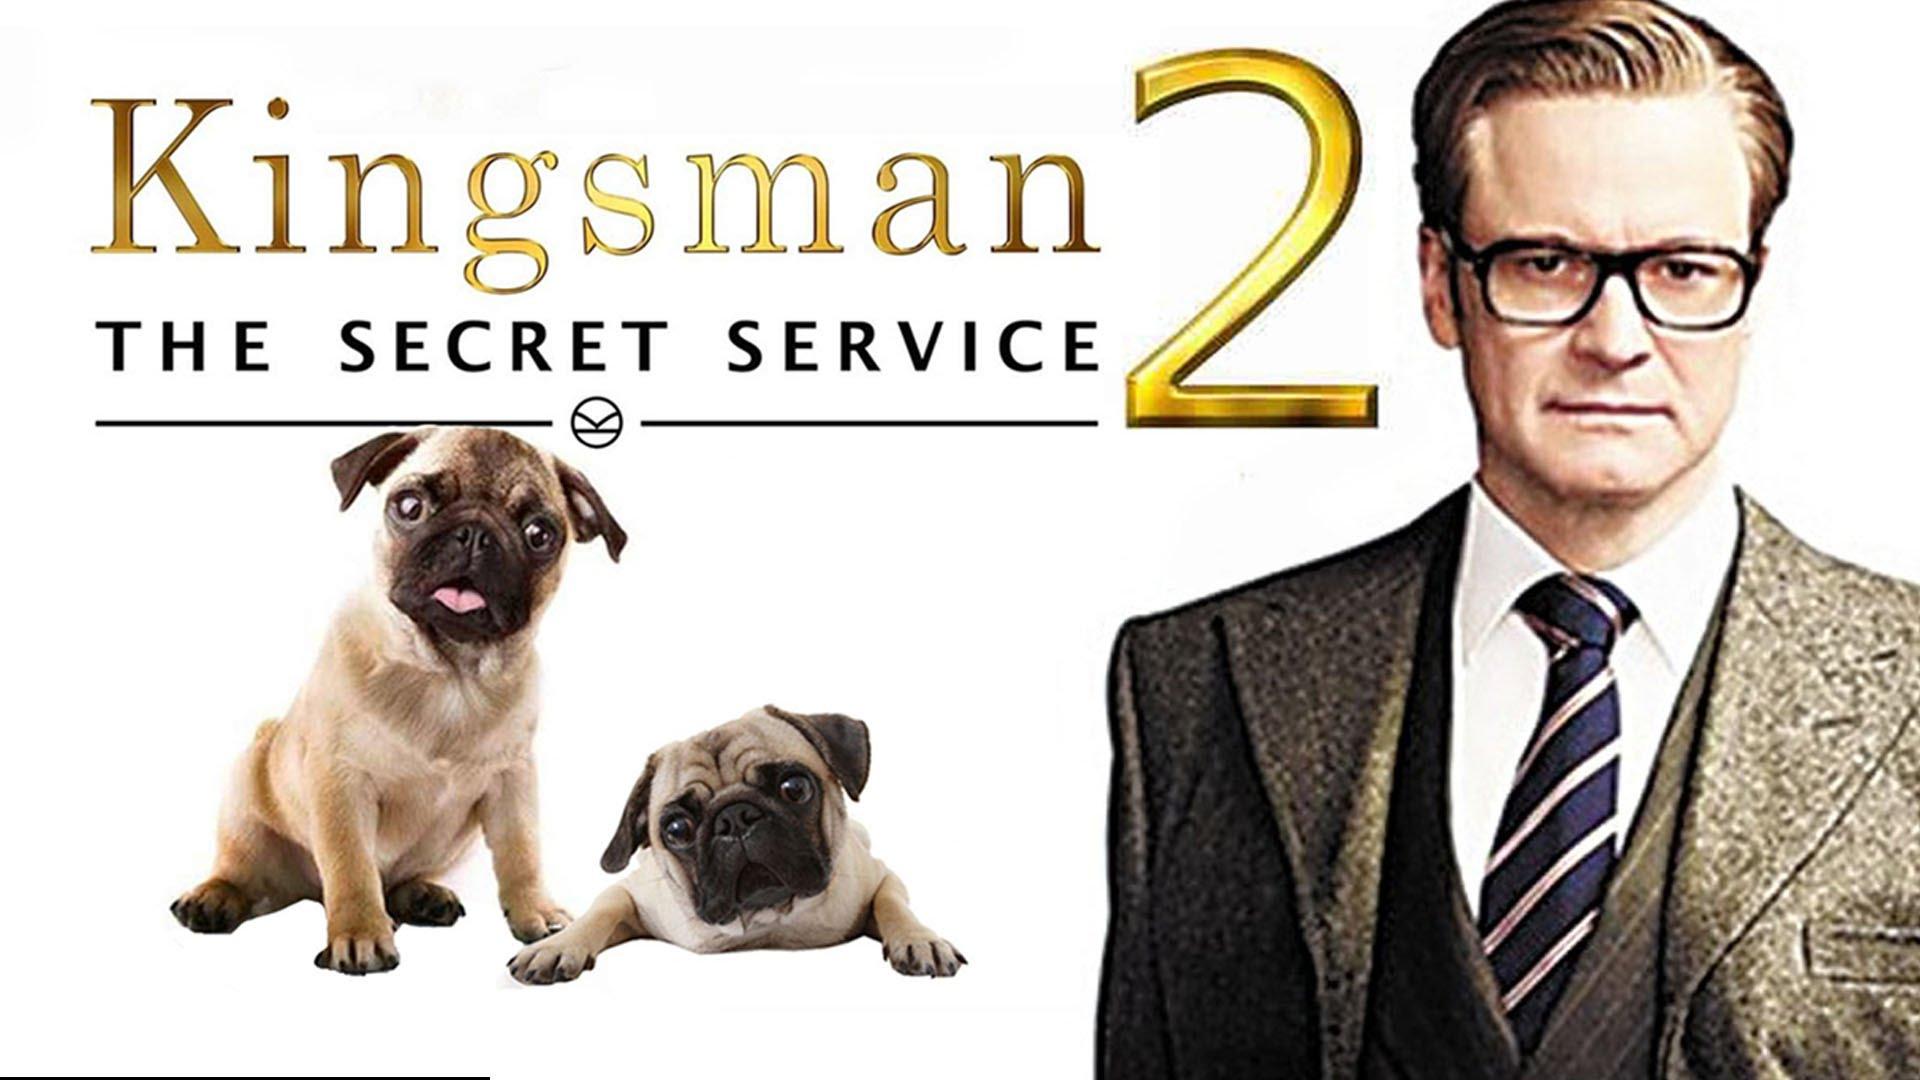 Kingsman movie offer tickets